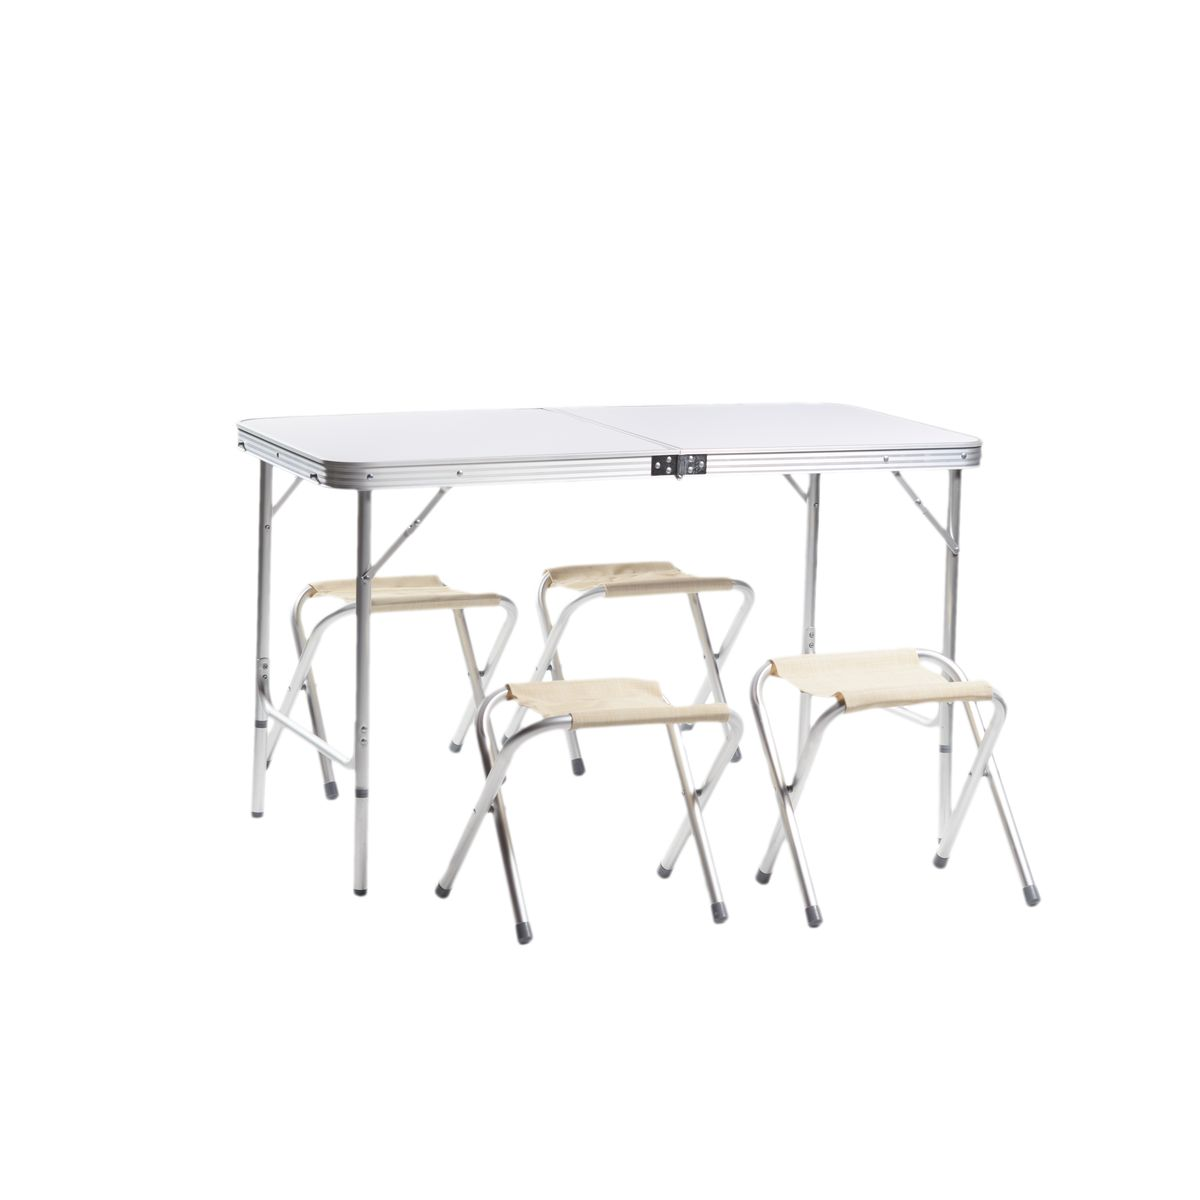 Набор мебели для пикника Green Glade М5102, 5 предметов набор мебели для пикника green glade м5102 5 предметов